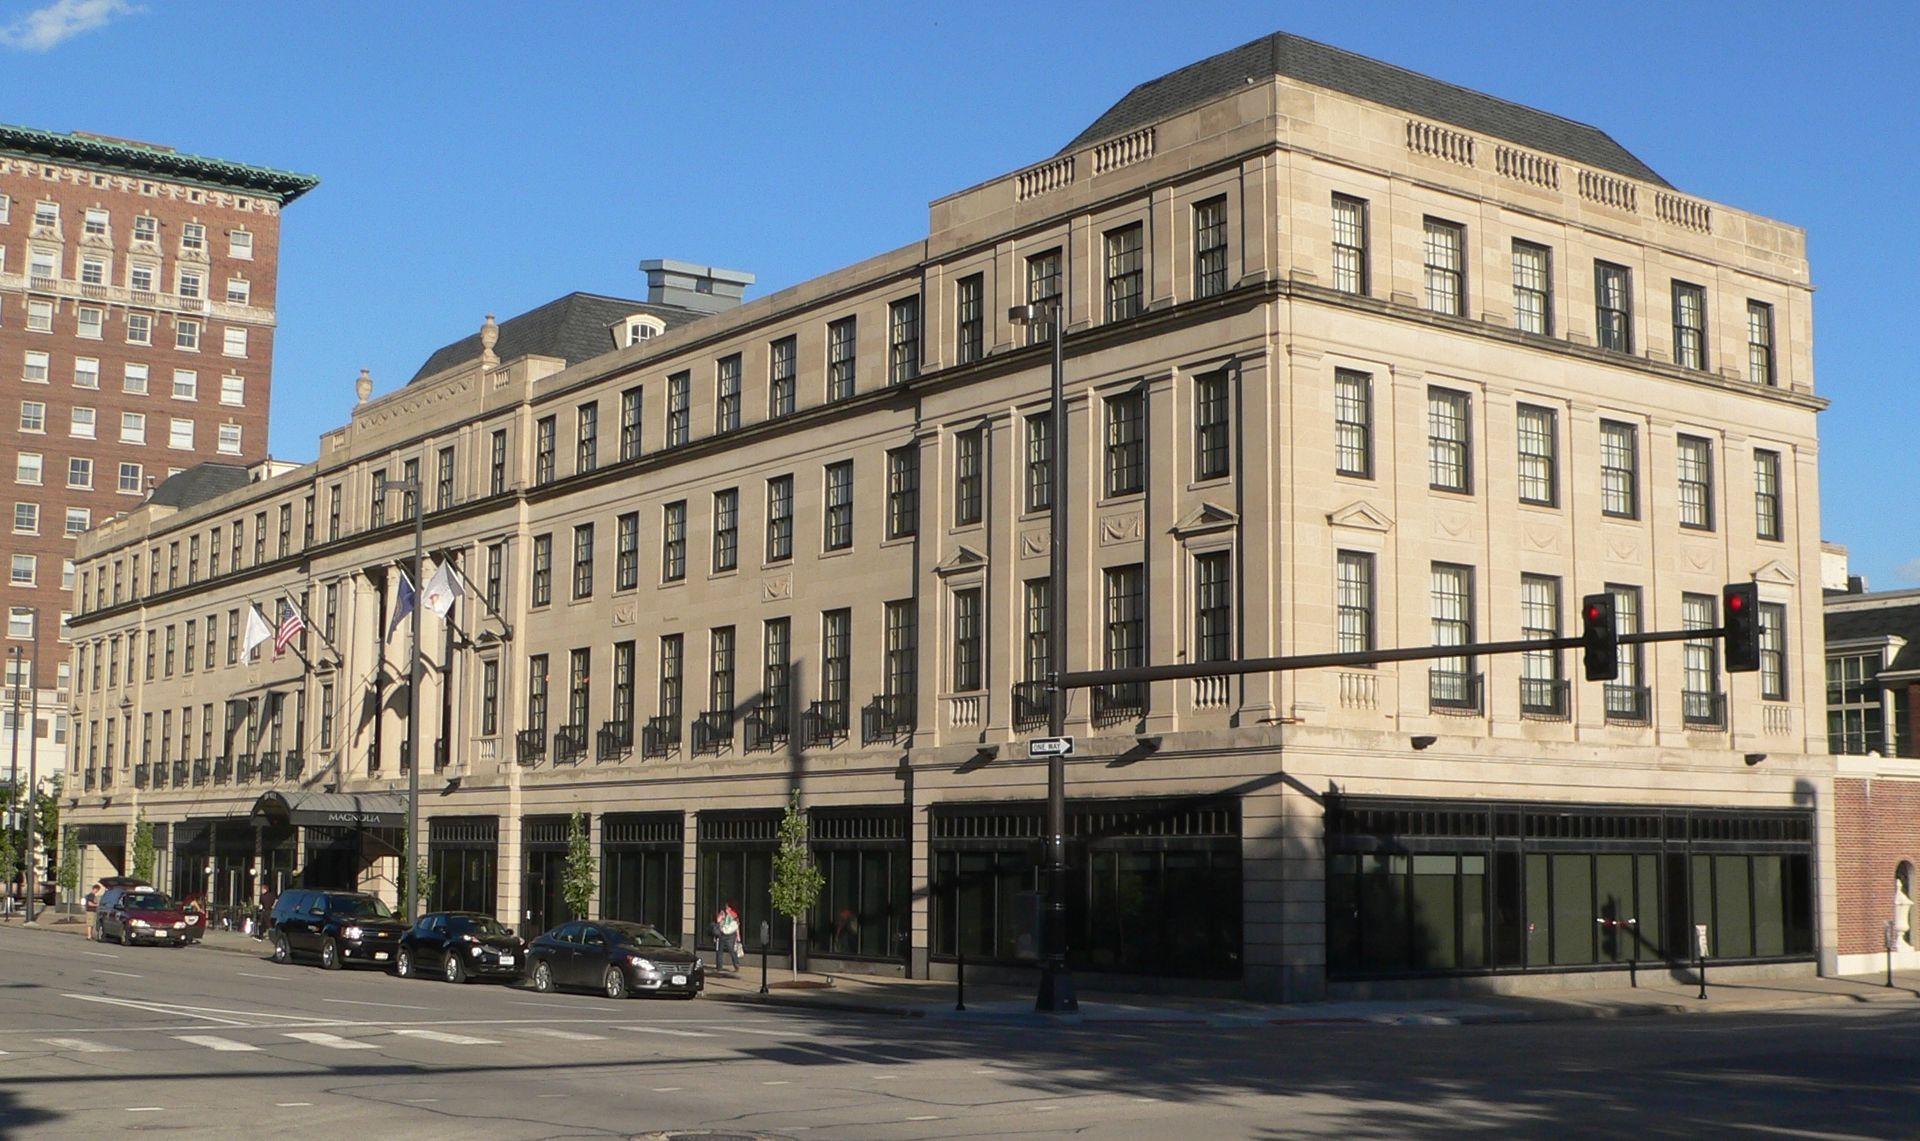 Magnolia hotel omaha wikipedia for Architecture firms omaha ne